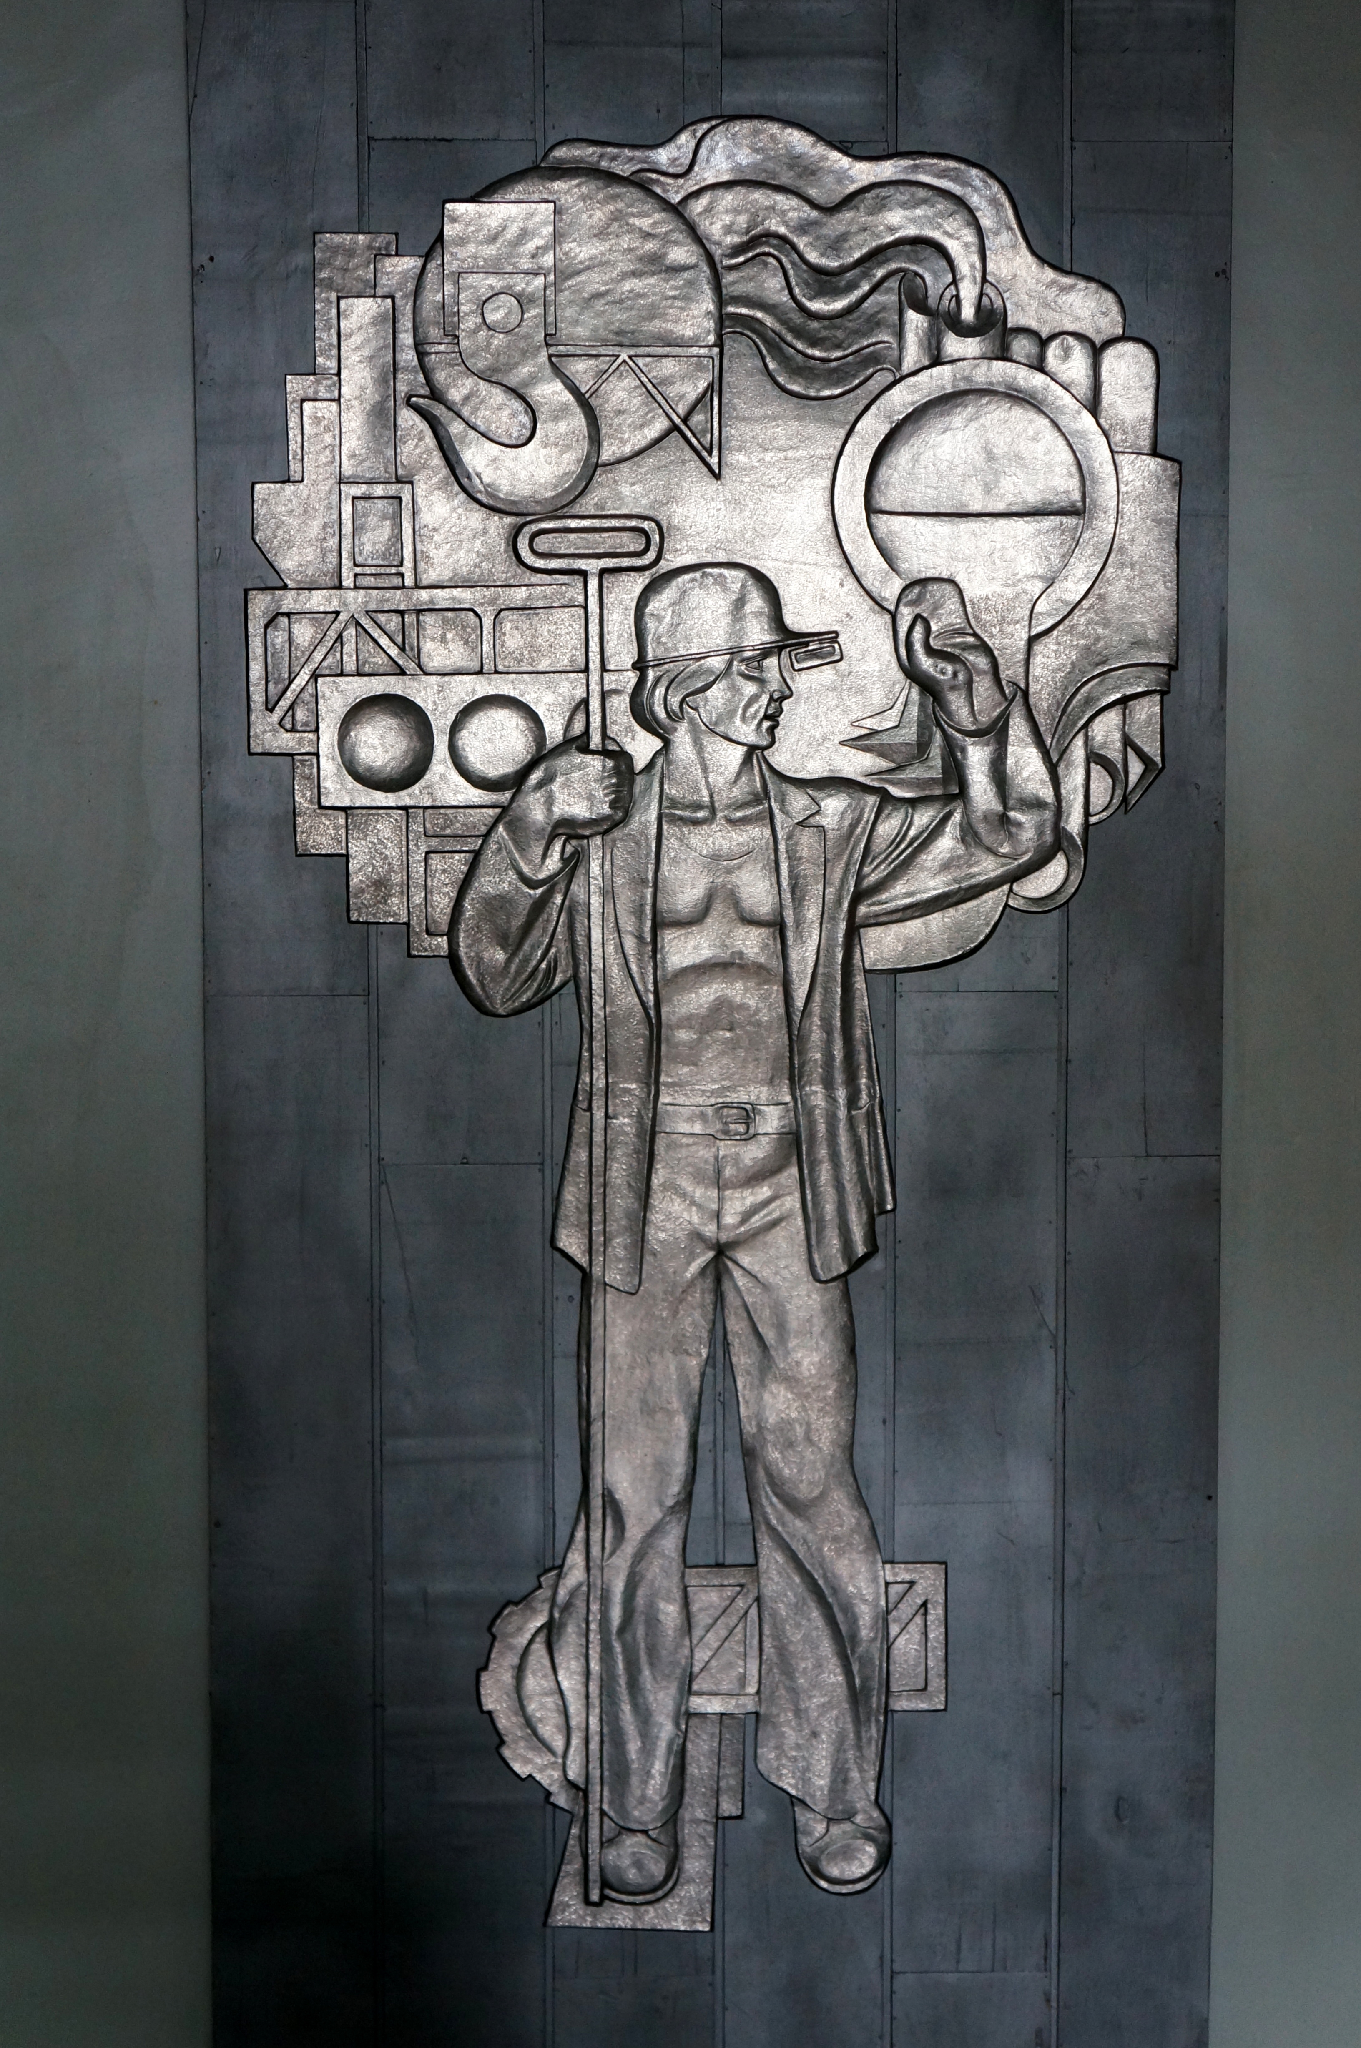 проспект Дмитра Яворницького, 93 Автор: https://goo.gl/HMVn5U